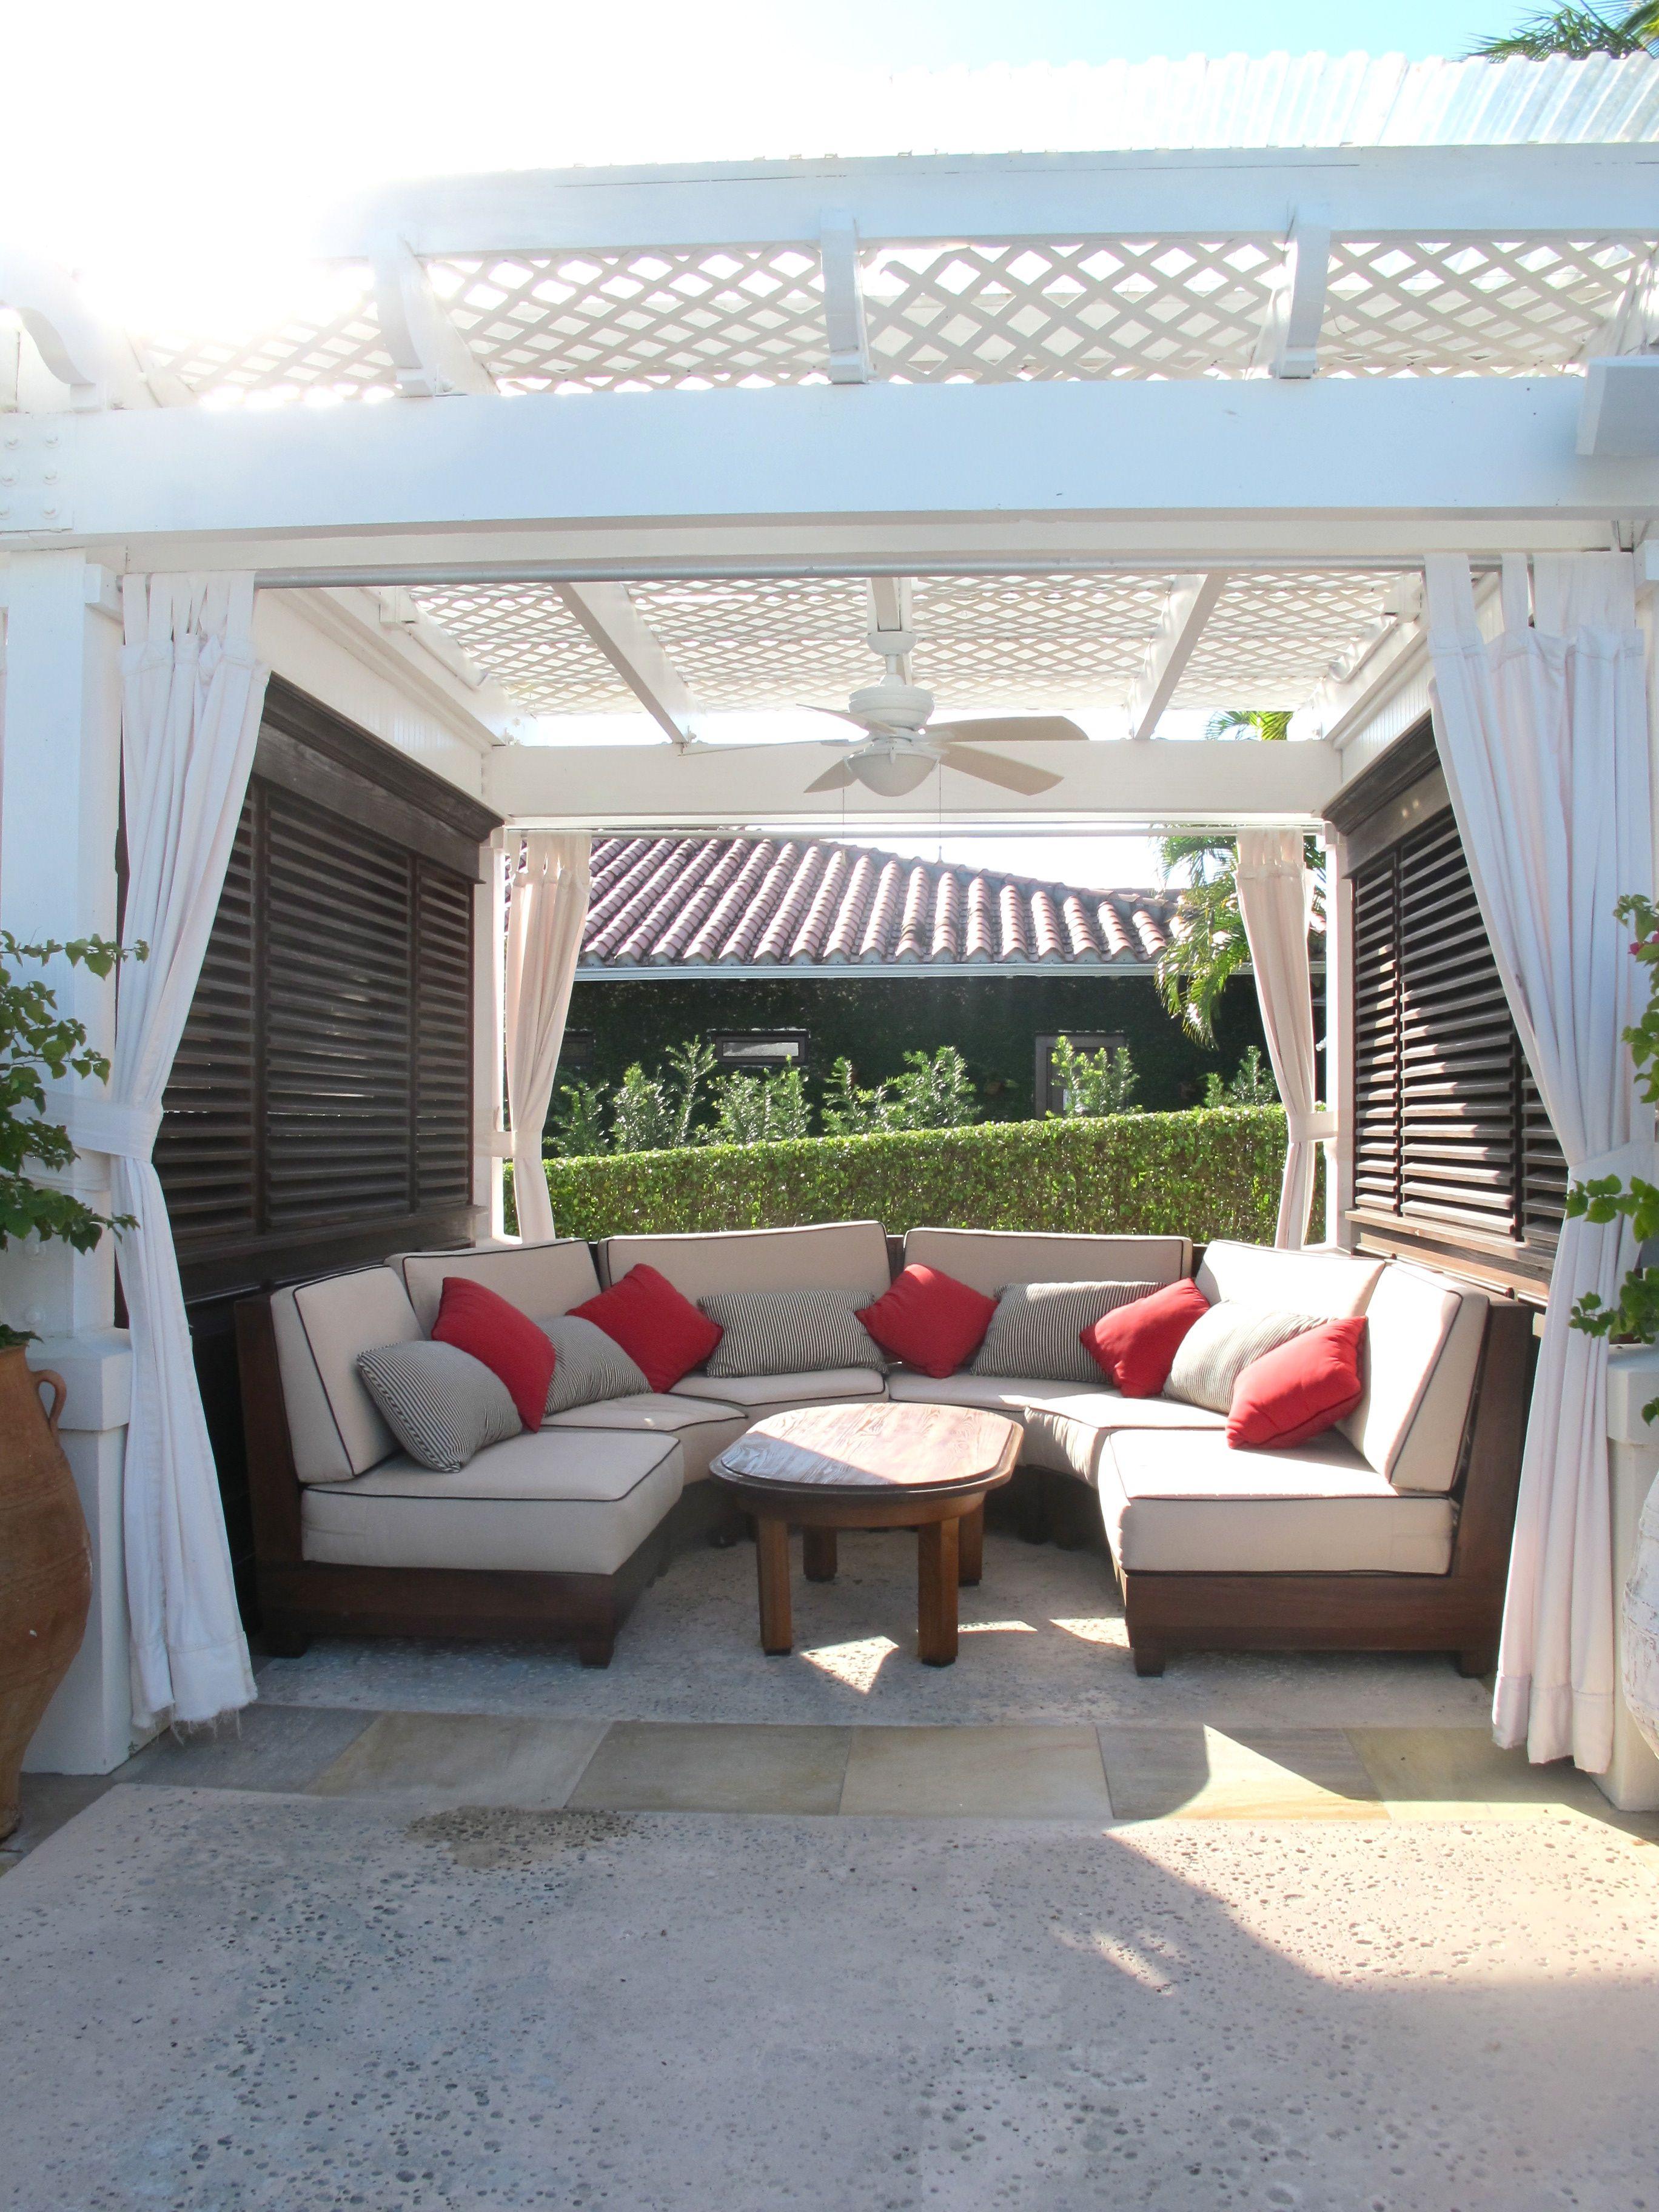 Poolside cabanas | Backyard pool, Backyard pool designs ... on Patio Cabana Ideas id=12074